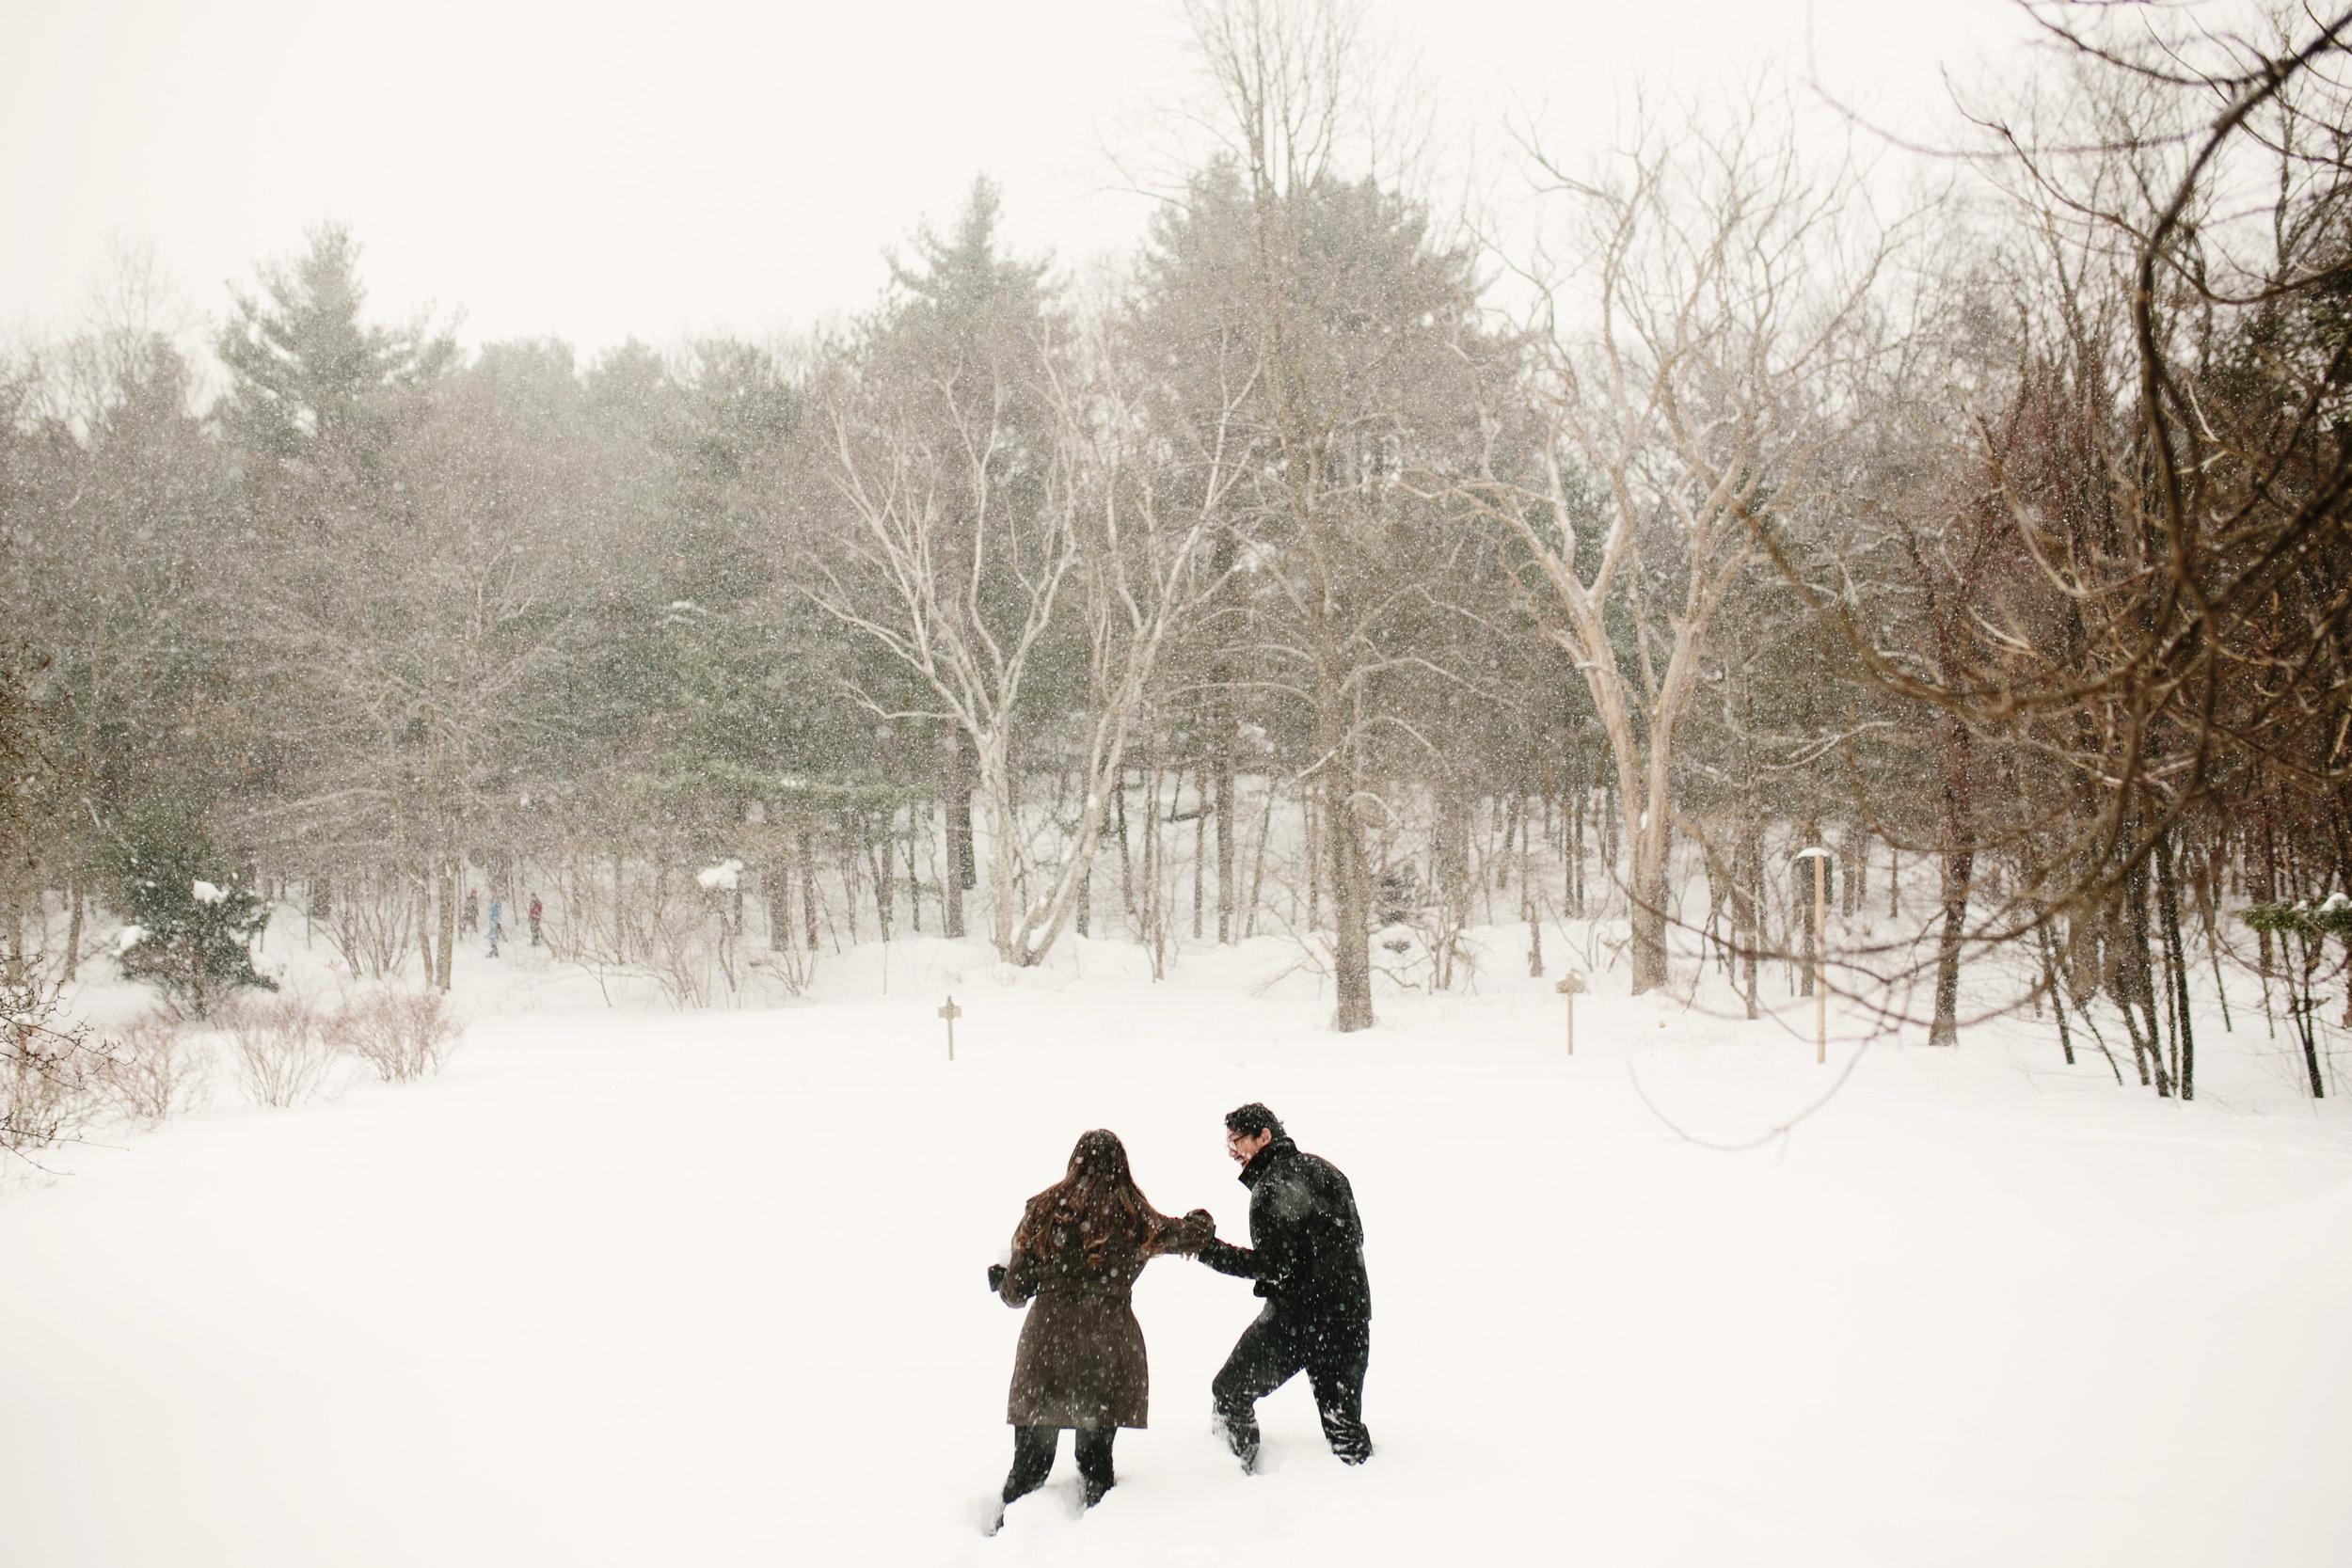 snowy engagement shoot in winter at mass audubon's habitat wildlife sanctuary in belmont